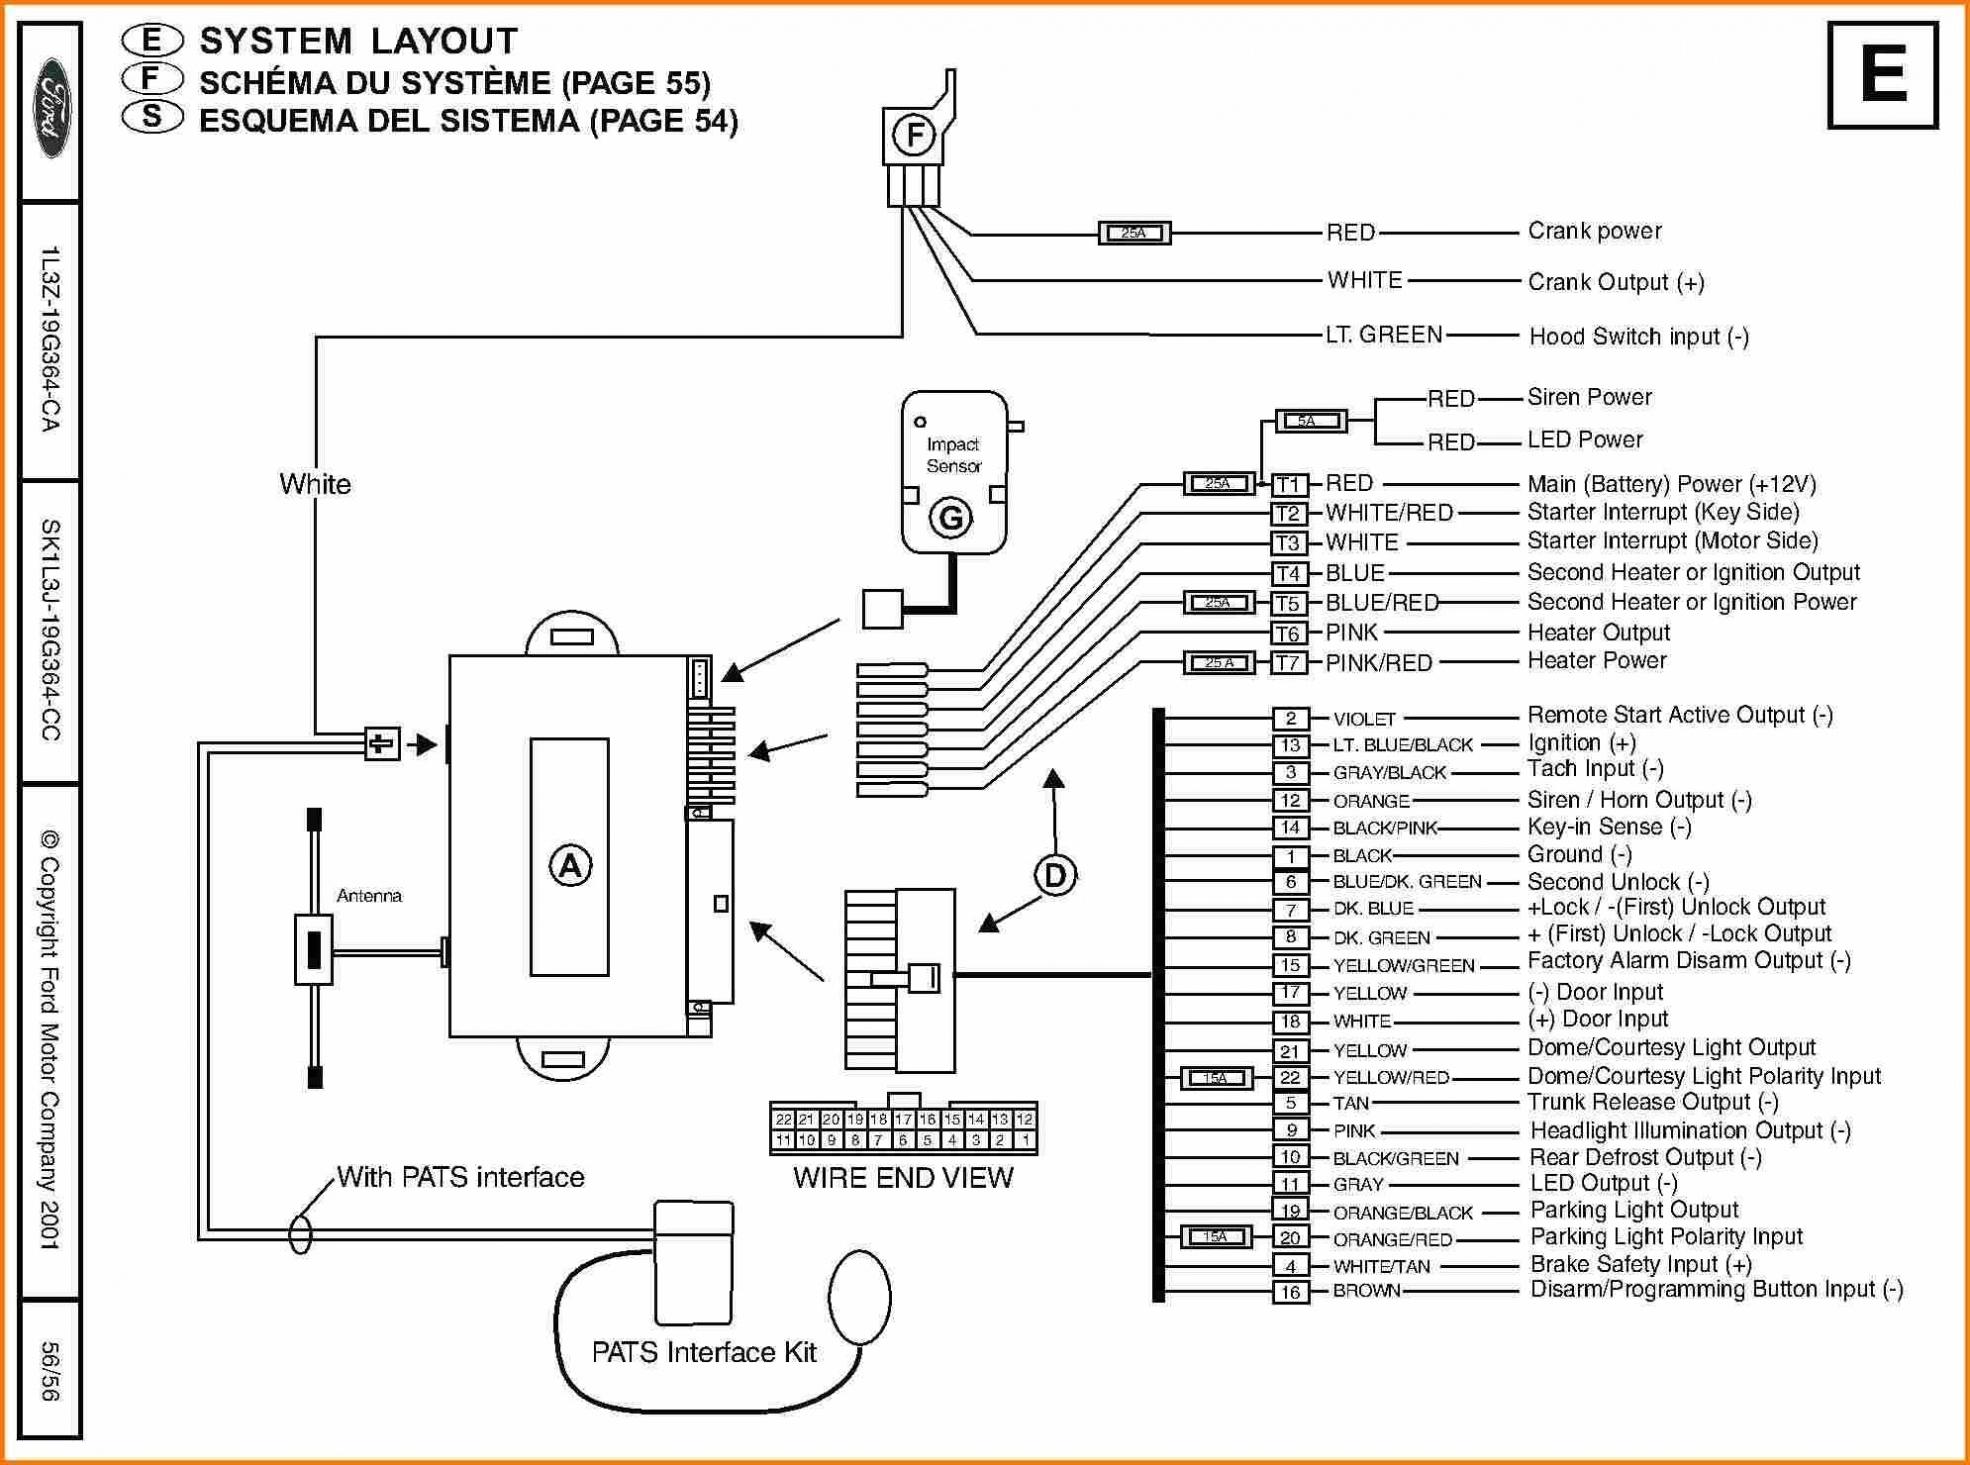 Dball2 Wiring Diagram — Daytonva150 - Dball2 Wiring Diagram